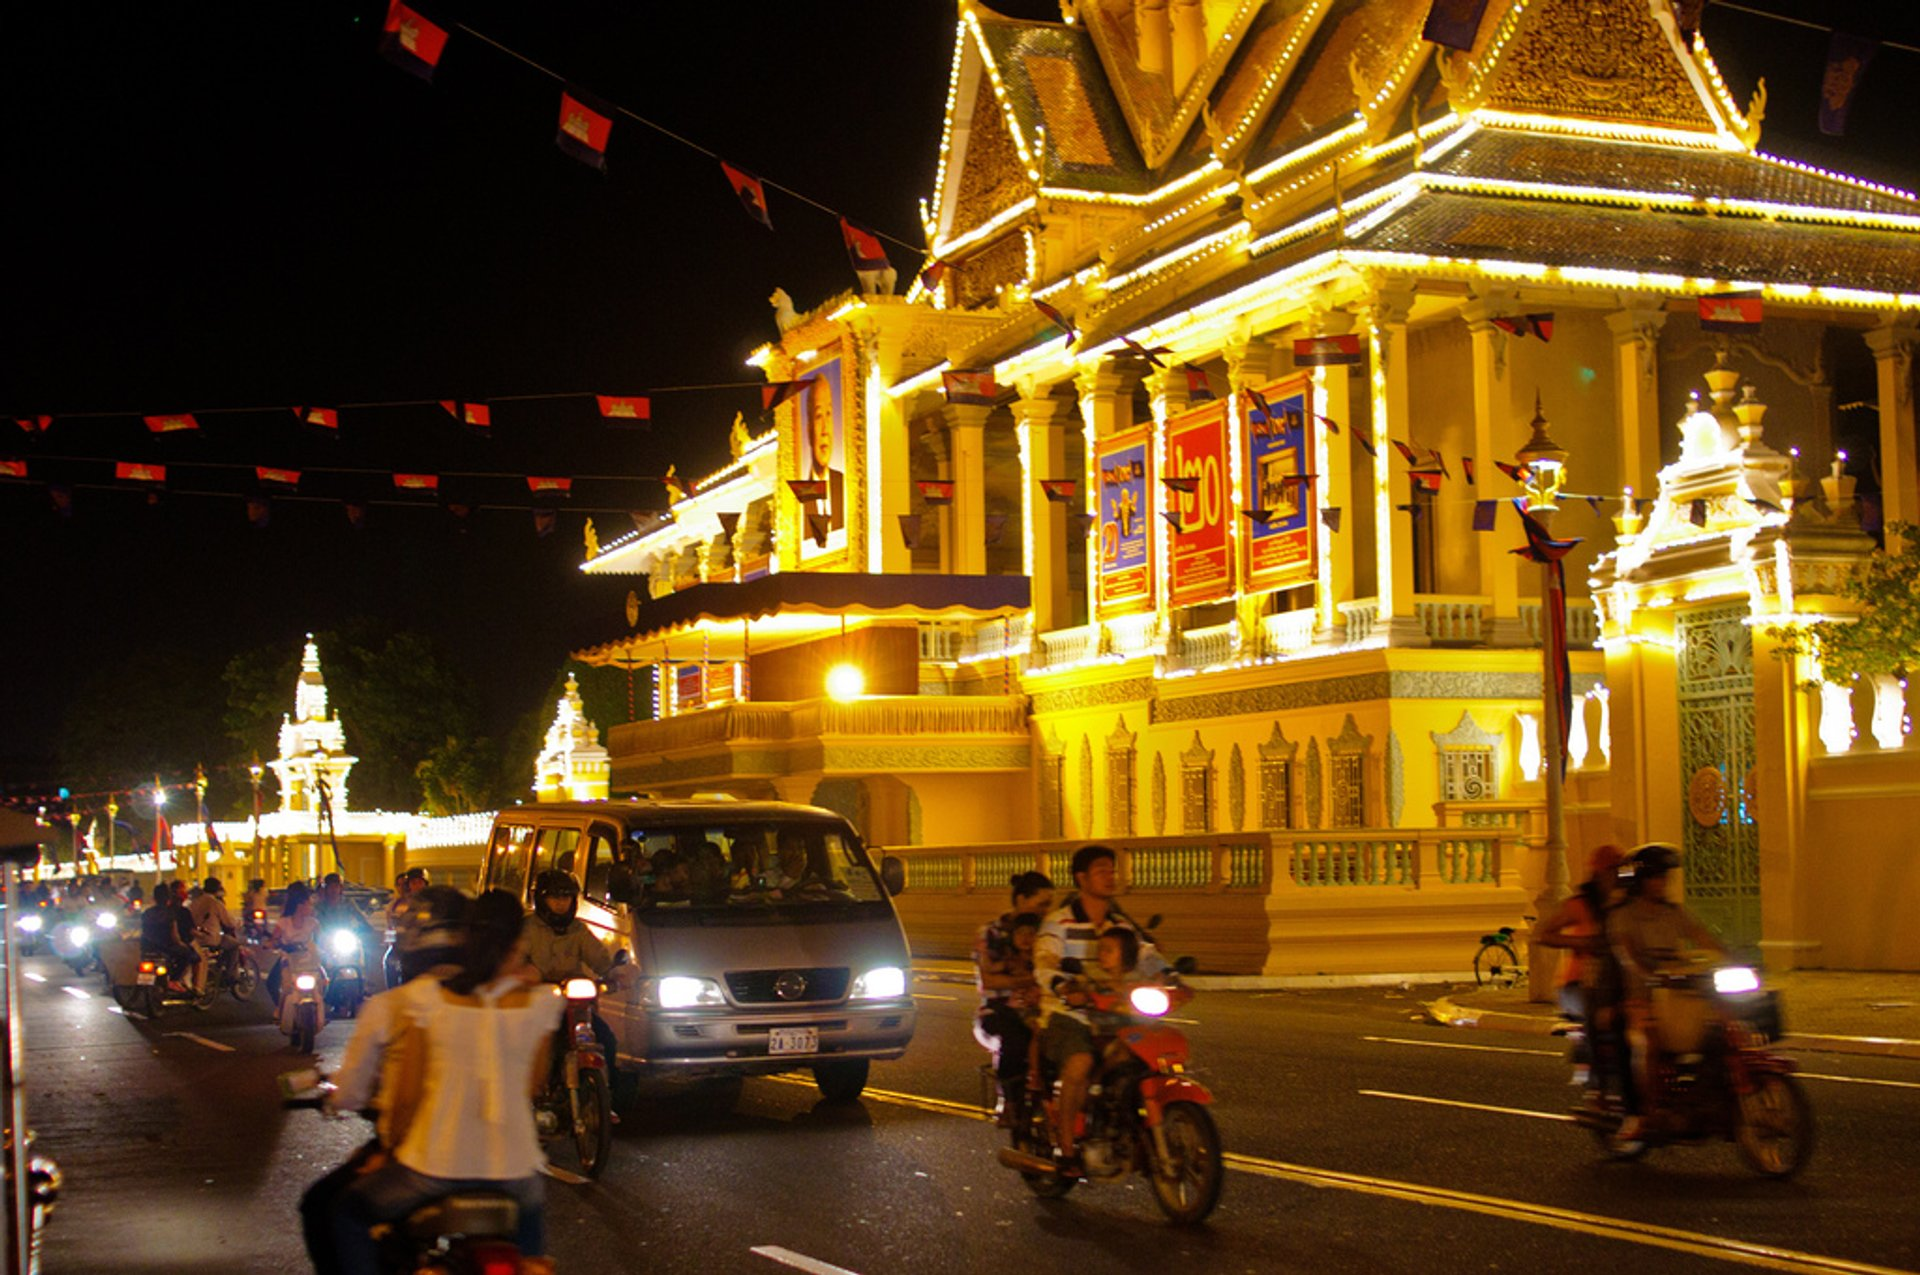 King's Birthday Celebration in Cambodia - Best Season 2019